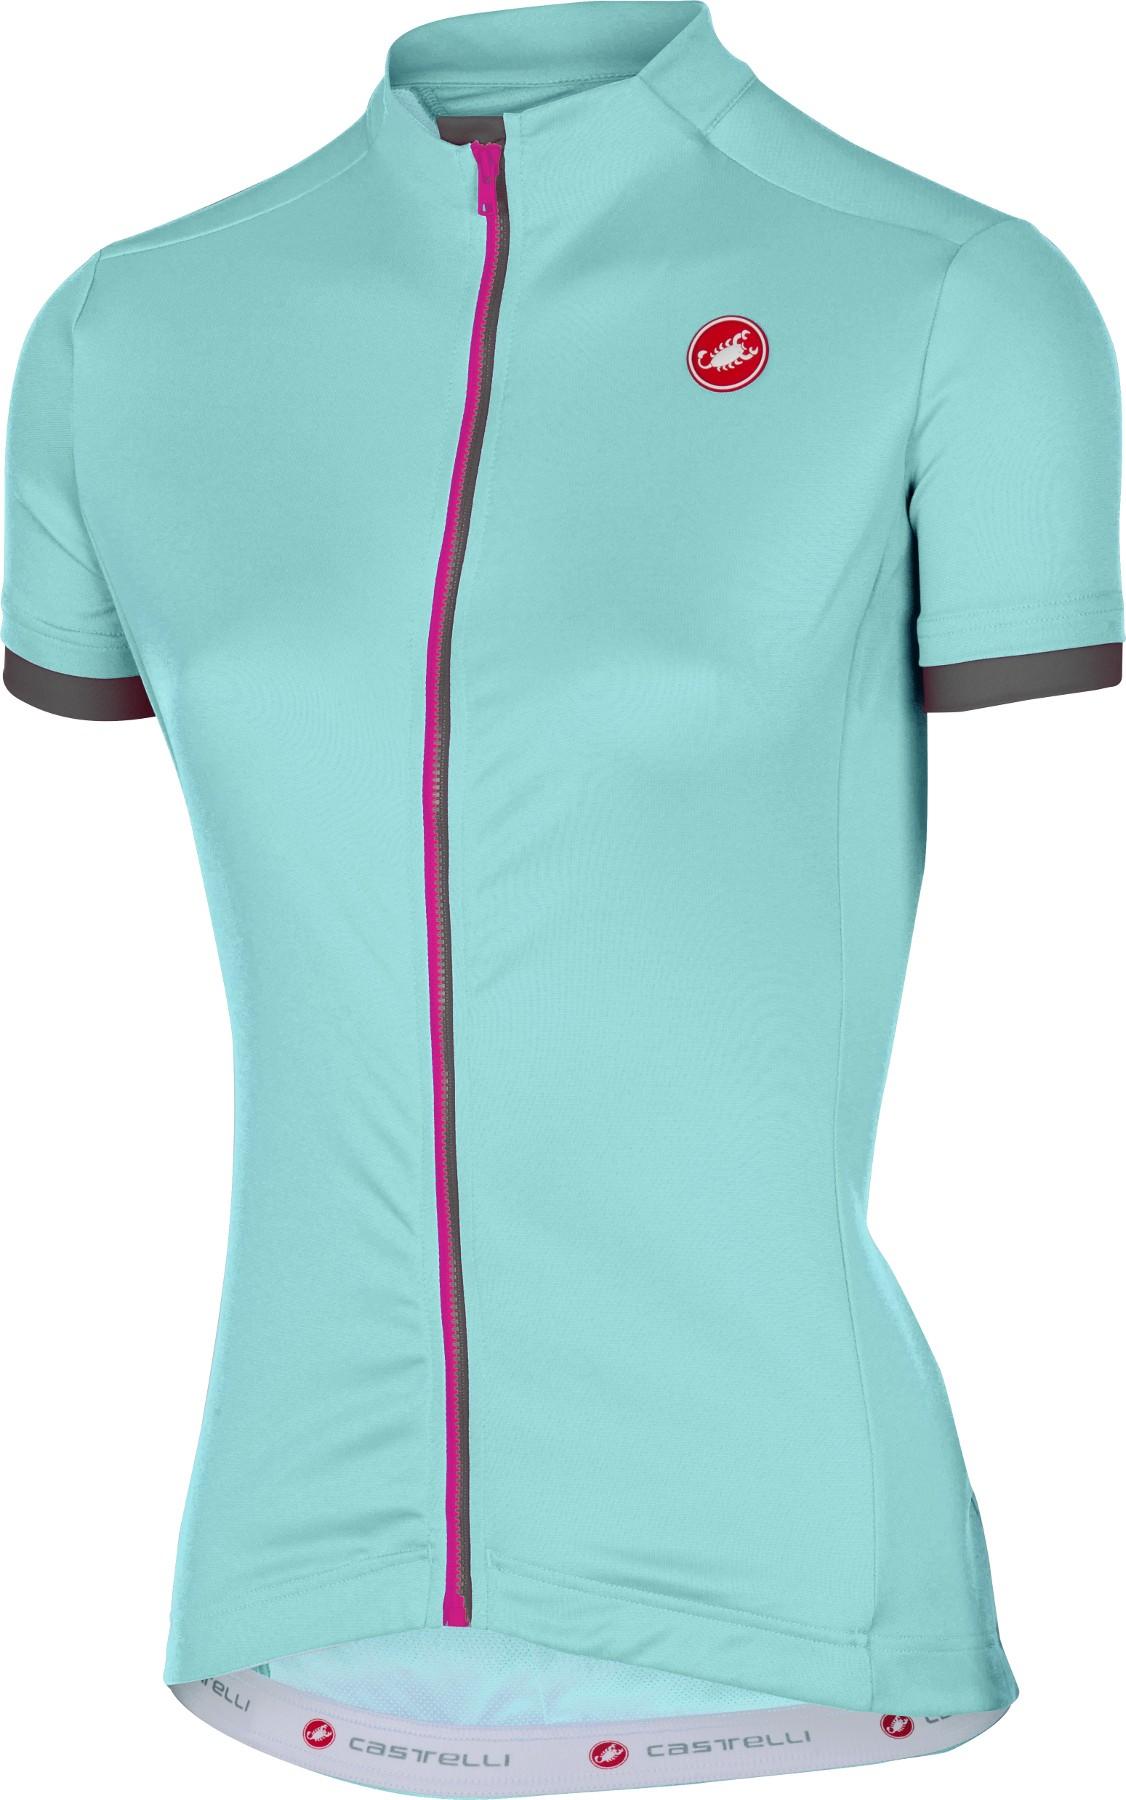 Castelli Anima Womens Short Sleeve Cycling Jersey